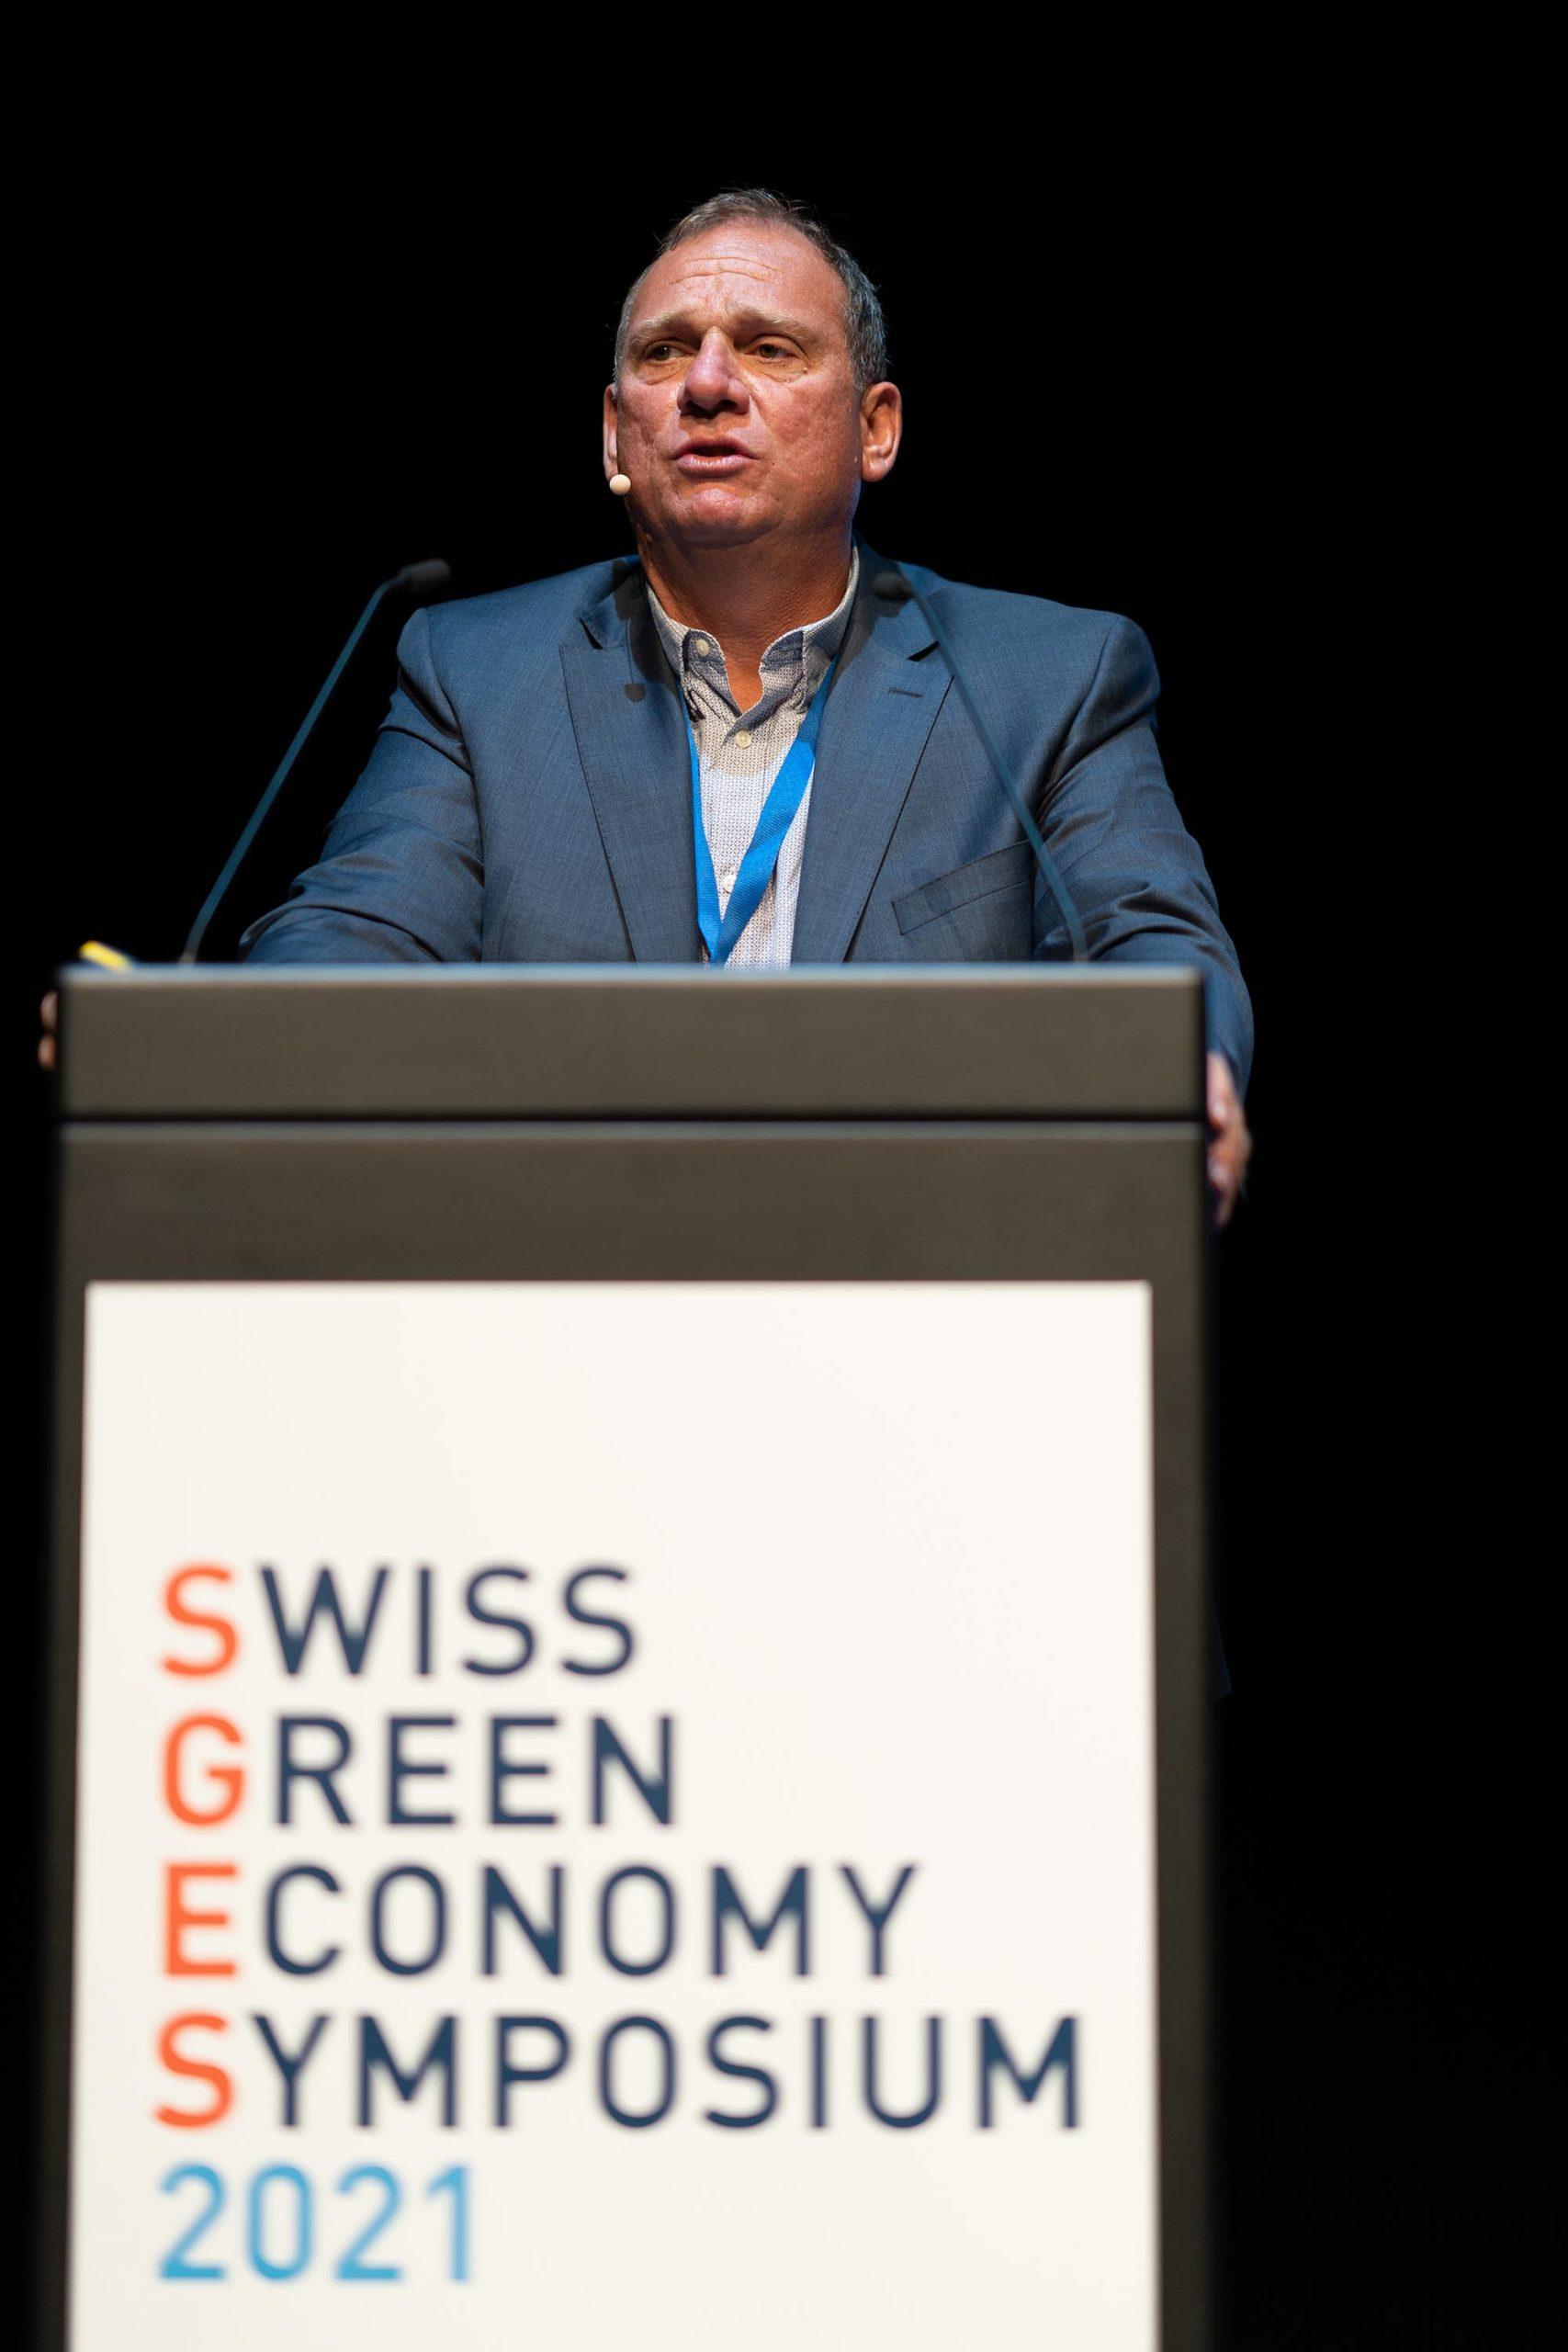 SGES Keynote: Prof. Dr. Michael Süss, Verwaltungsratspräsident, OC Oerlikon